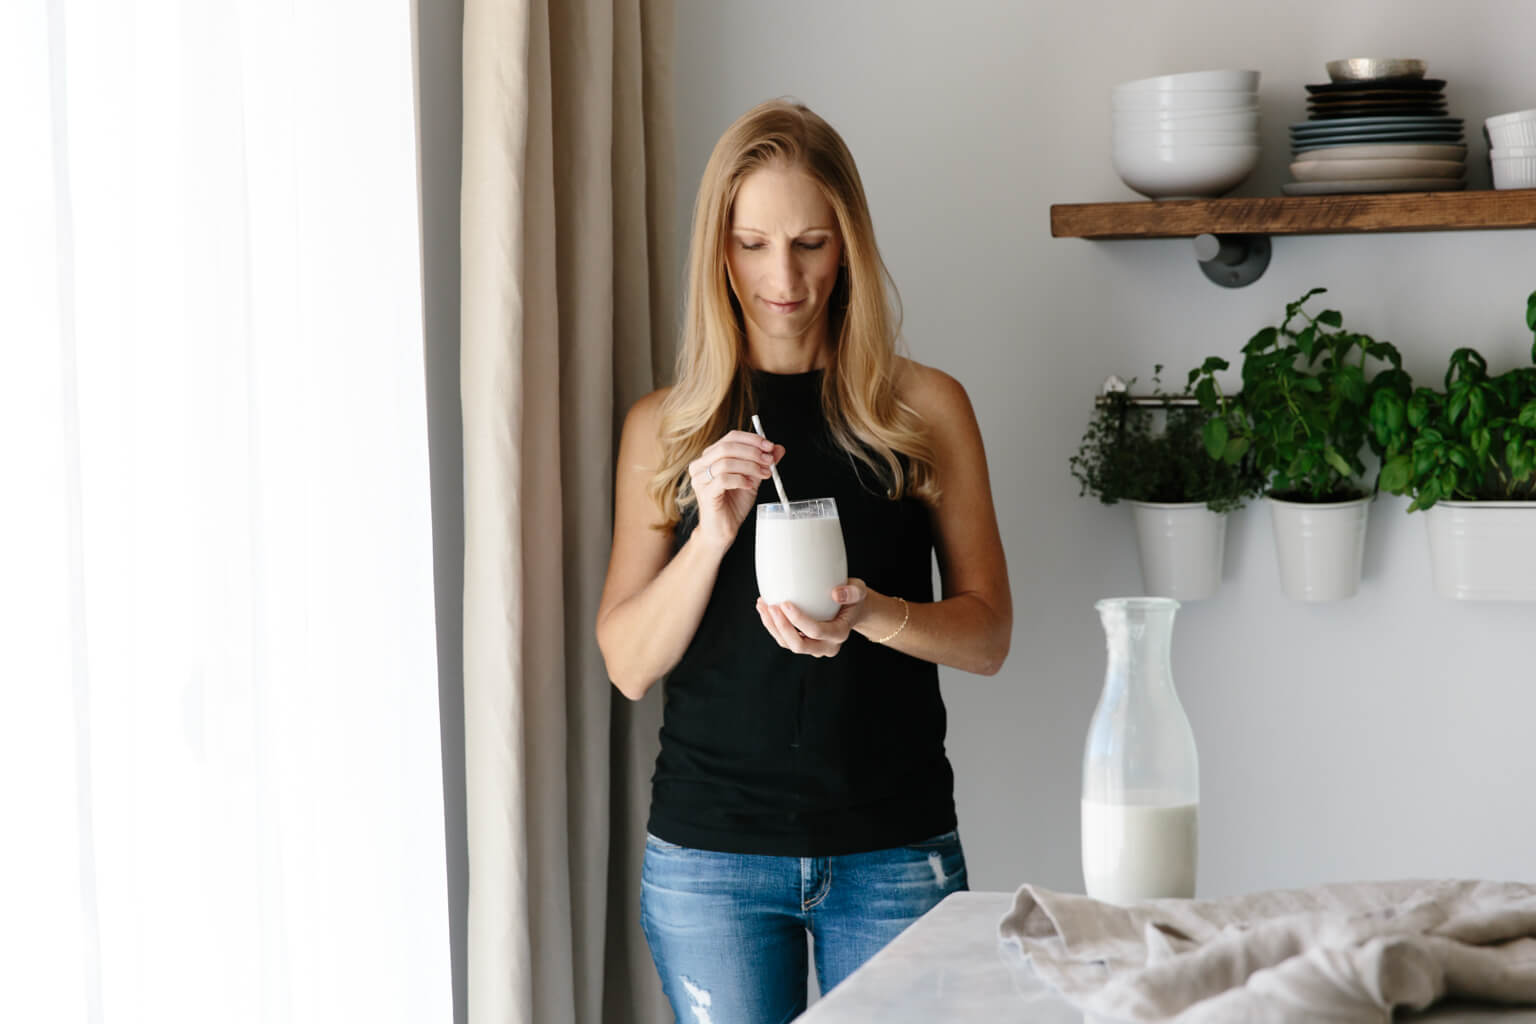 Girl standing and drinking cashew milk